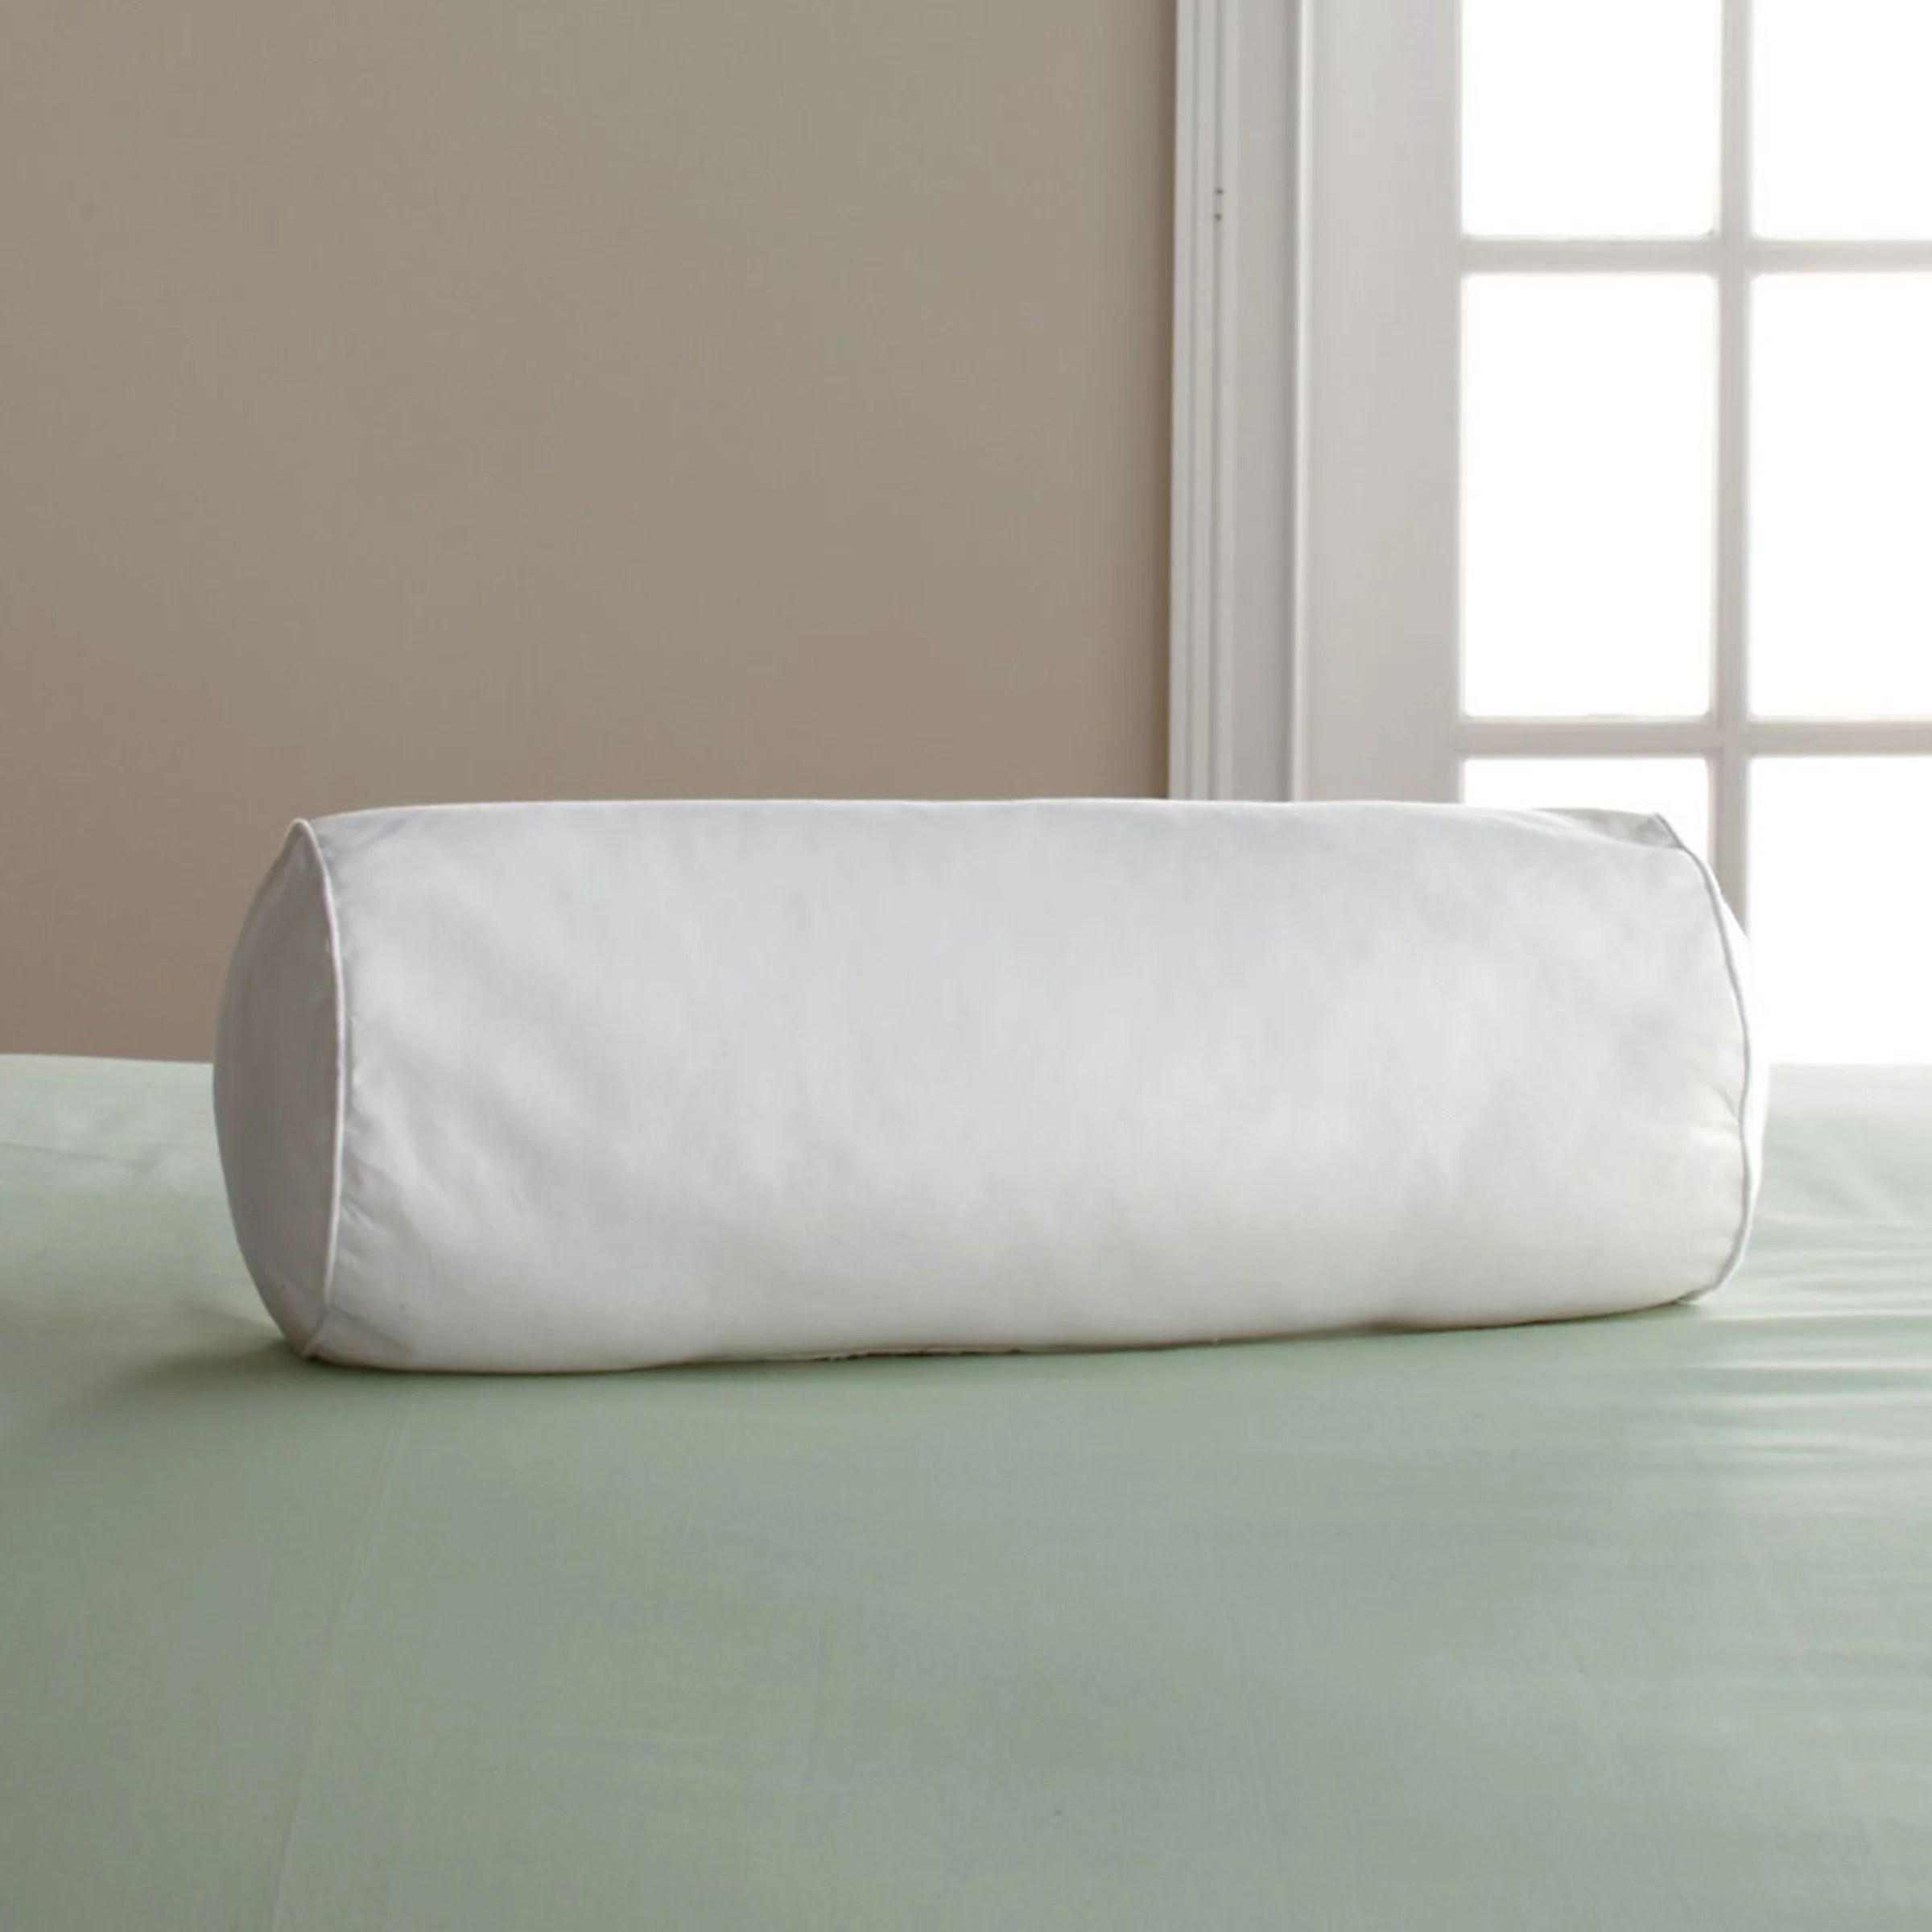 company down free medium density neckroll pillow insert white